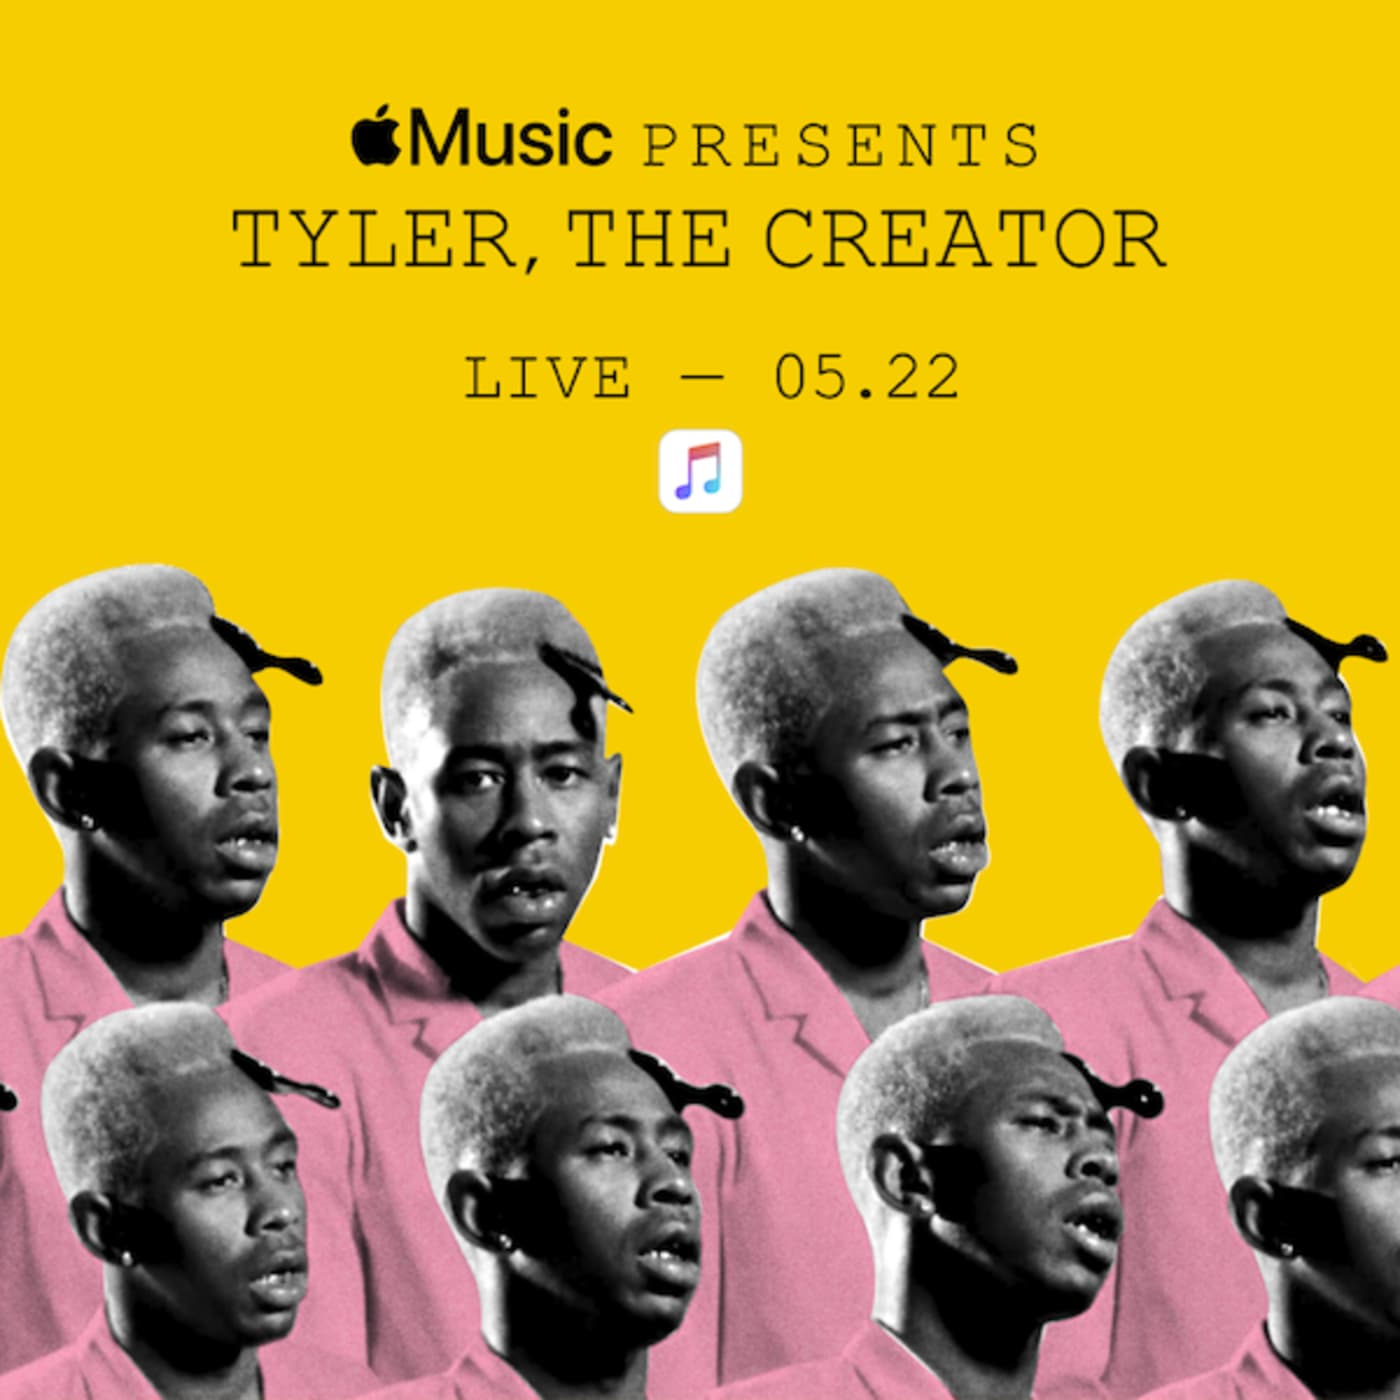 Tyler, the Creator Apple Music stream